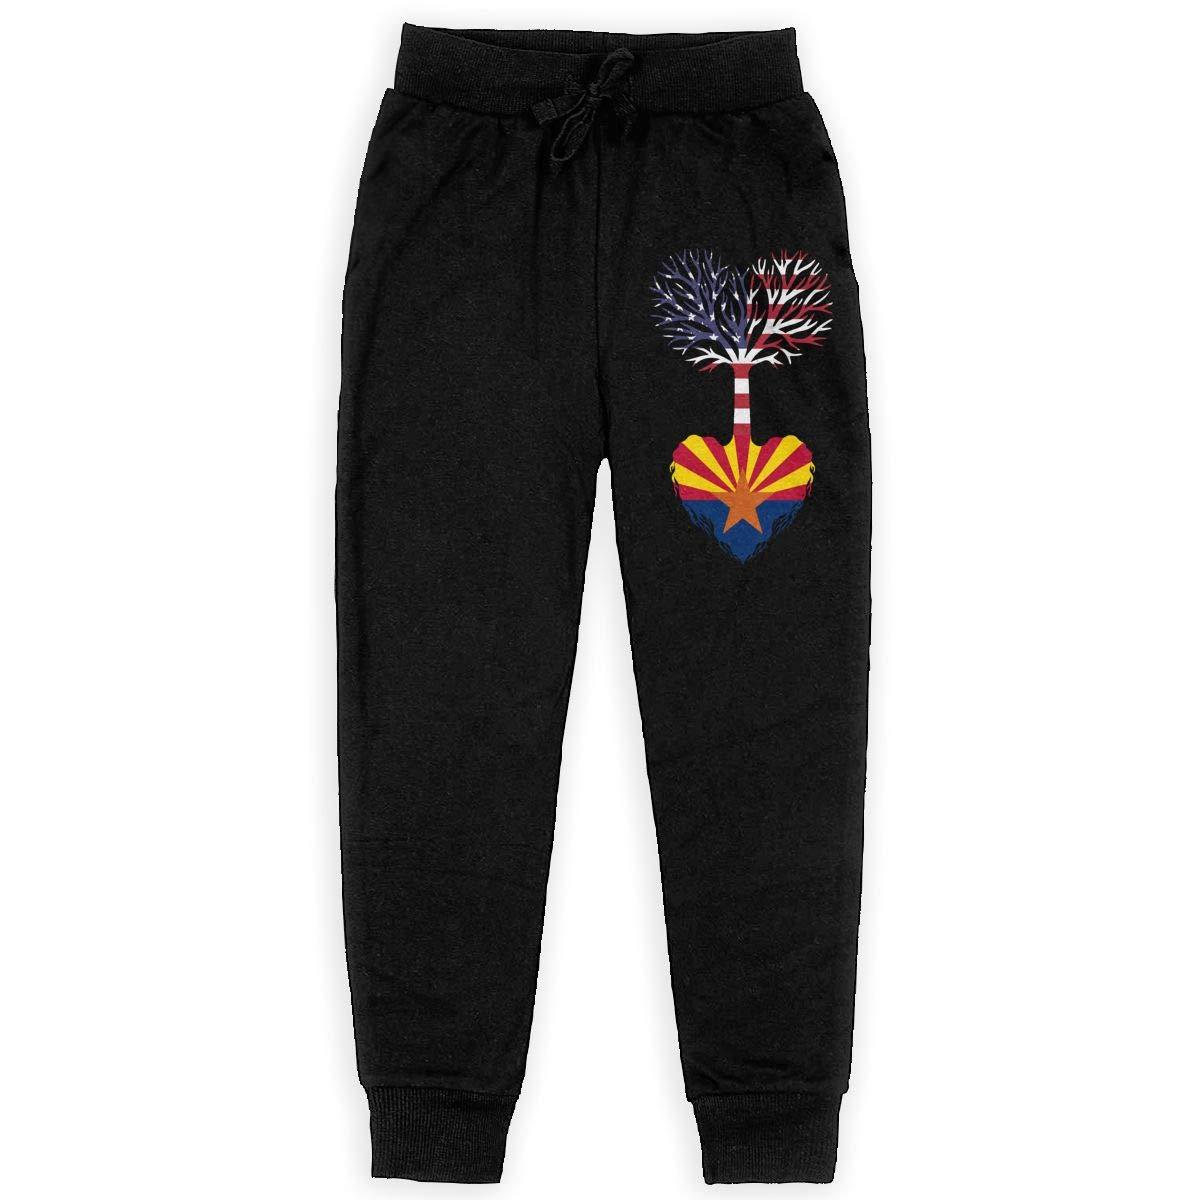 Teenager Fleece Pants for Teenager Boys American Grown Arizona Root Soft//Cozy Sweatpants